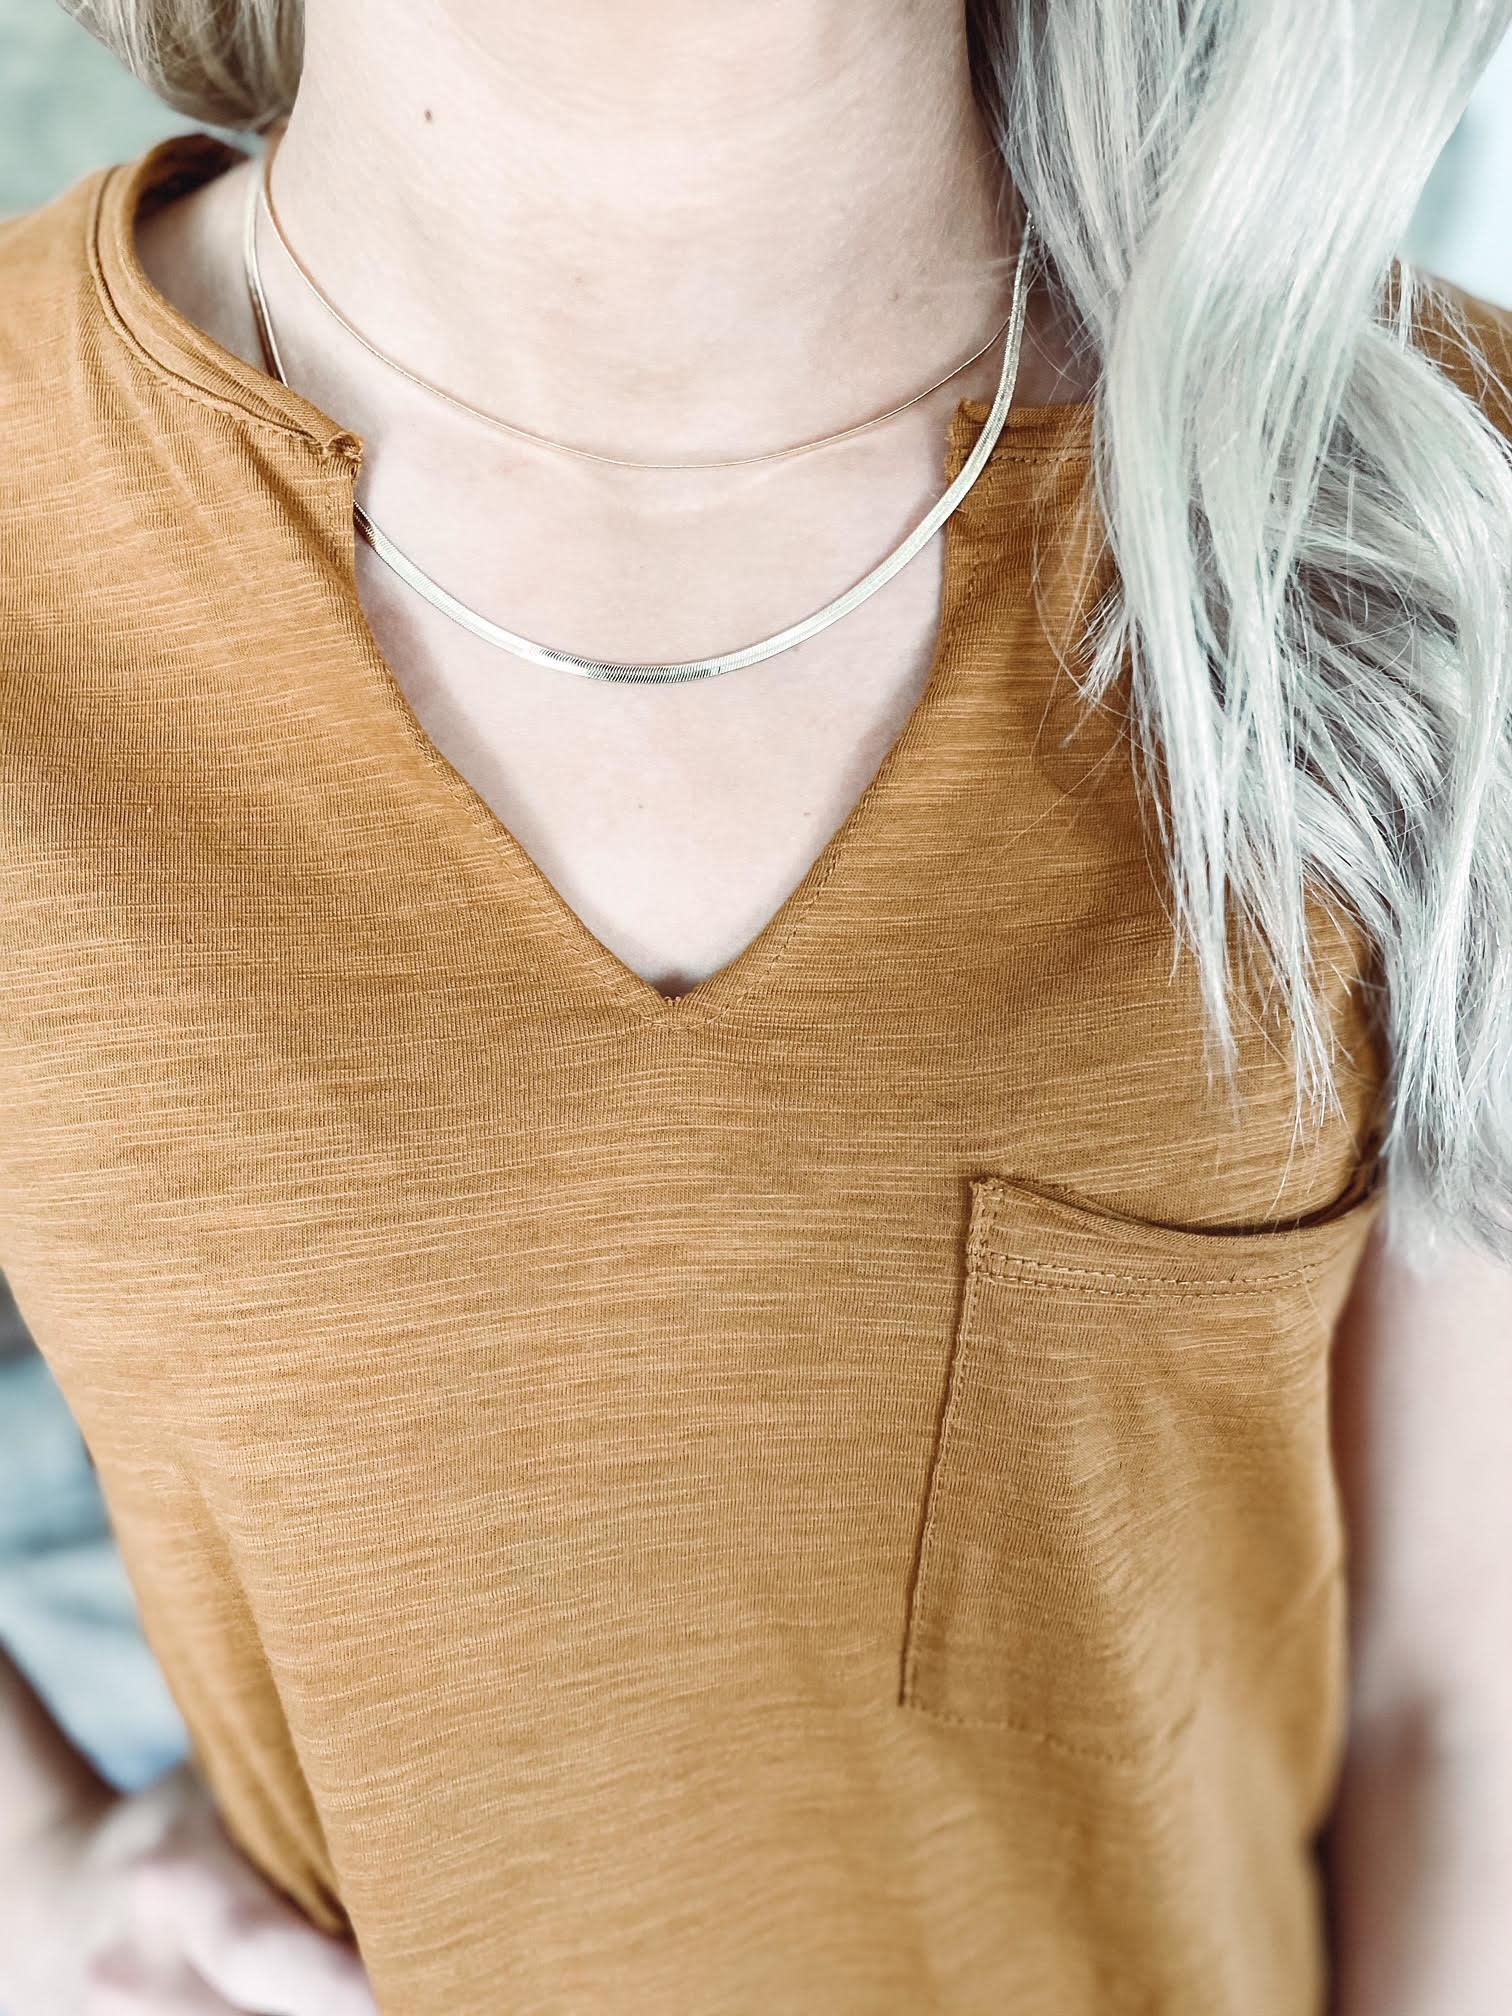 Whitney Gold Layered Necklace